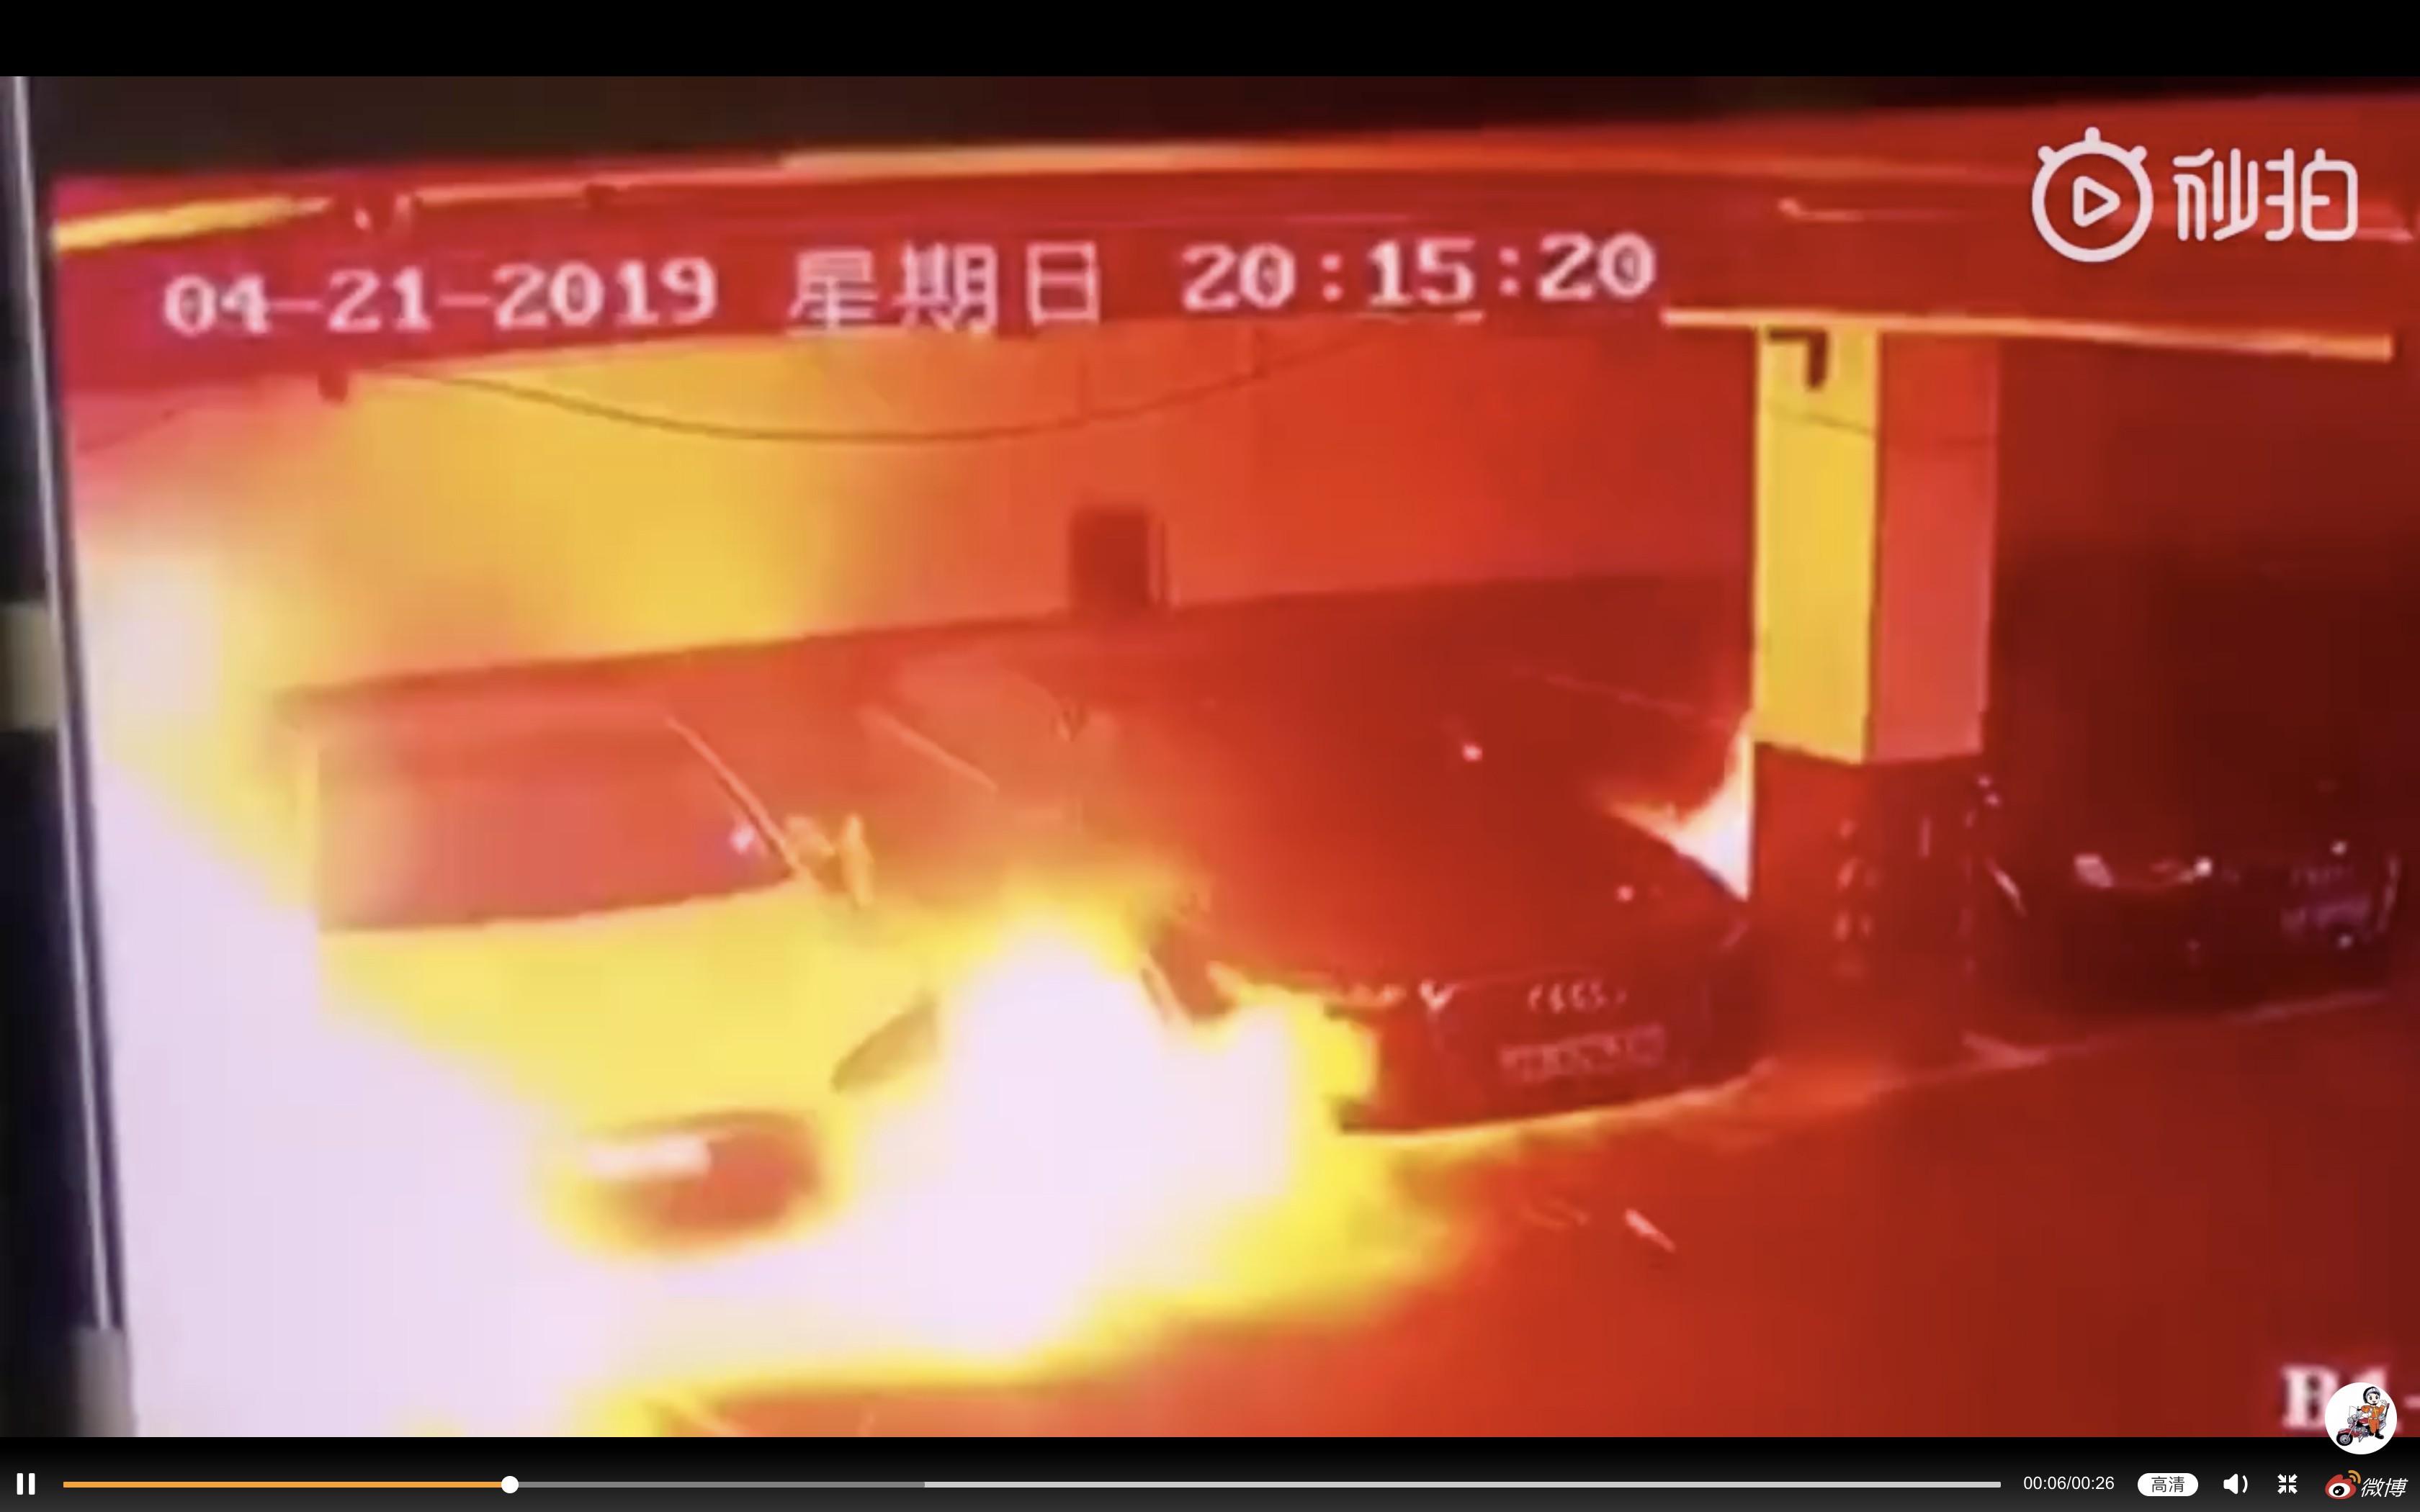 Tesla Model S explodes in Chinese car park, prompting investigation